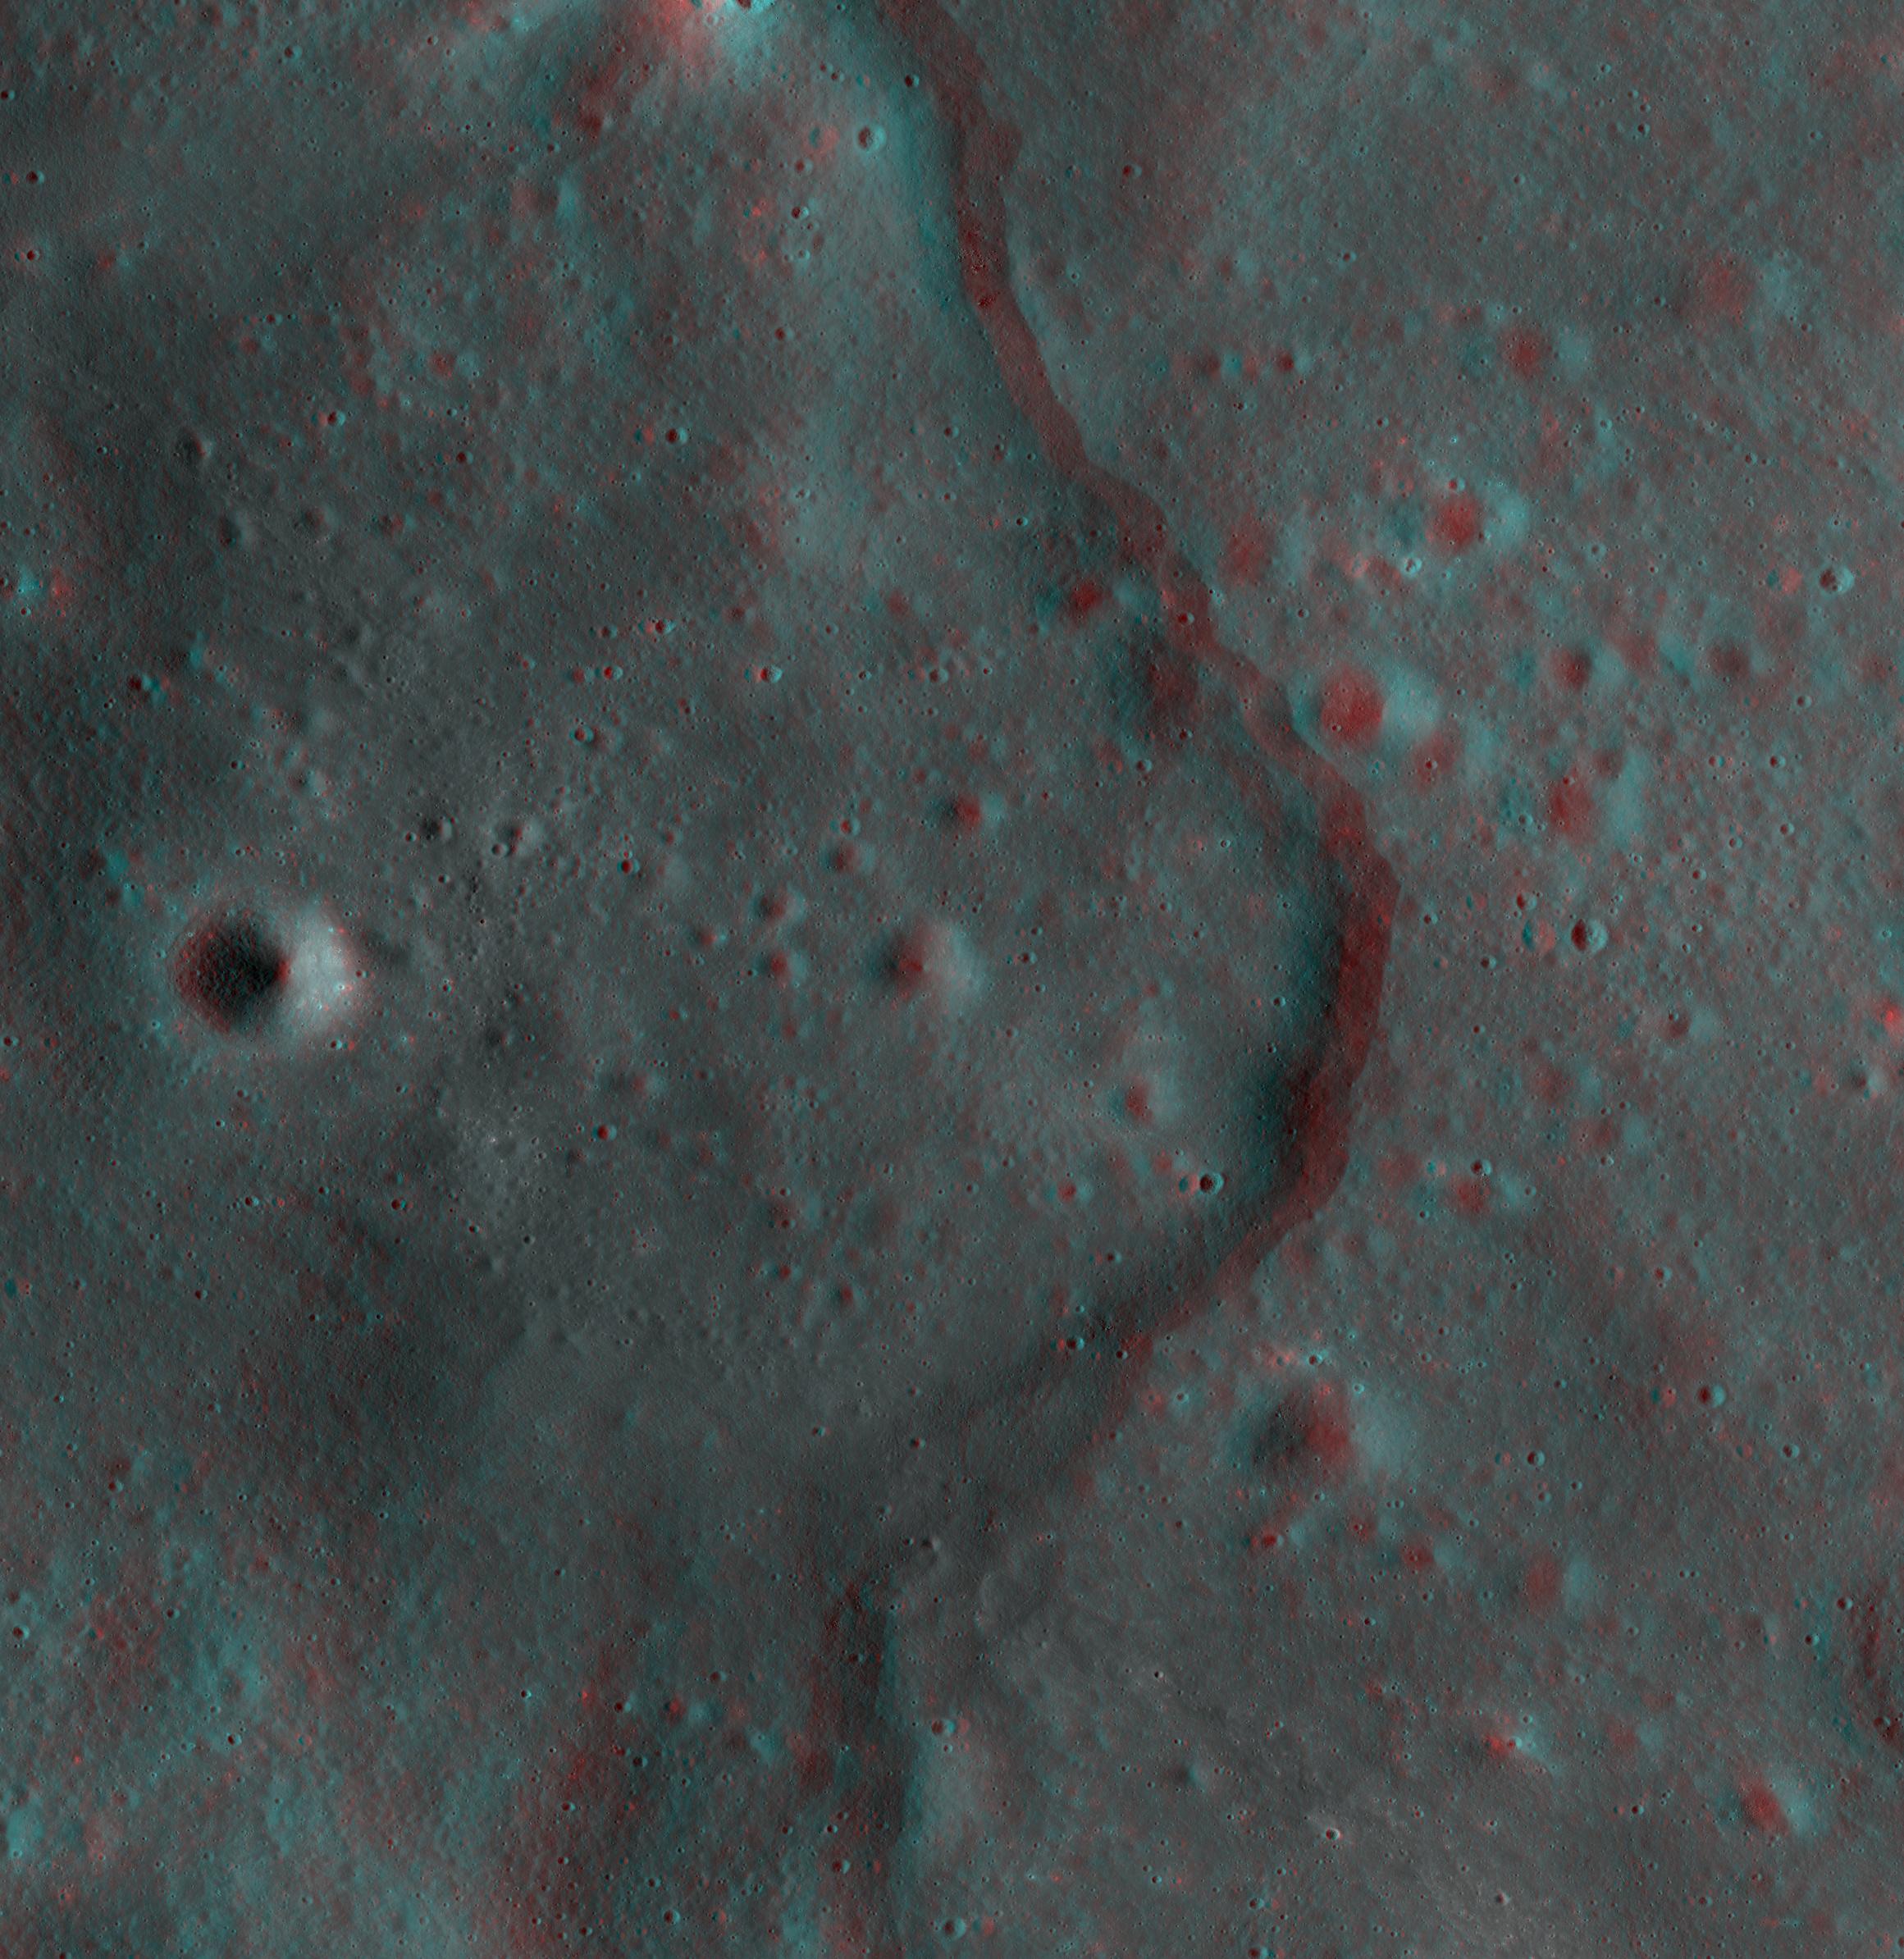 Lunar Reconnaissance Orbiter Explores the Moon in 3D  NASA